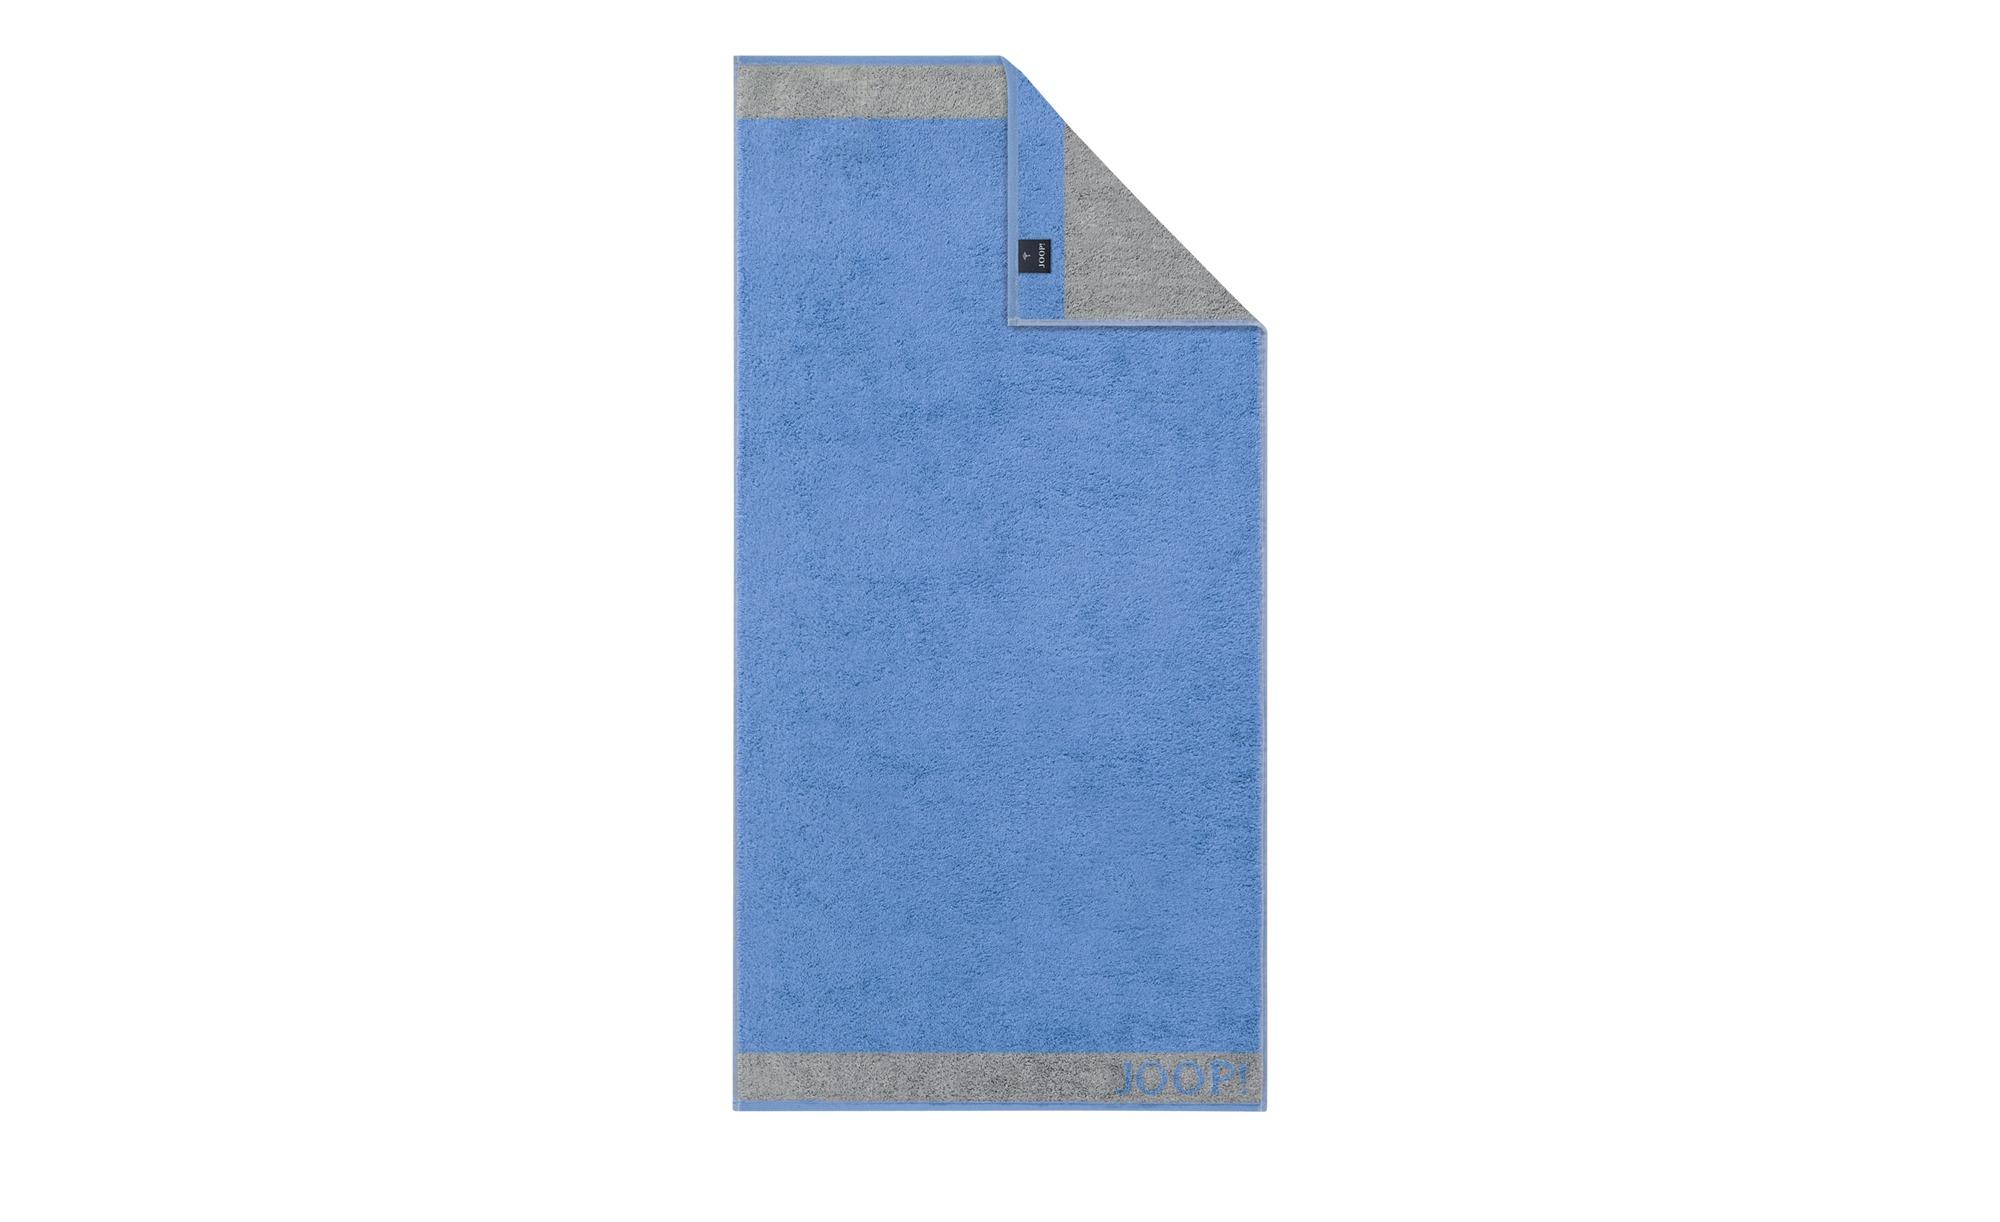 JOOP! Duschtuch  JOOP! 1668 Diamond Doubleface ¦ blau ¦ 100% Baumwolle  ¦ Maße (cm): B: 80 Badtextilien und Zubehör > Handtücher & Badetücher > Duschtücher - Höffner